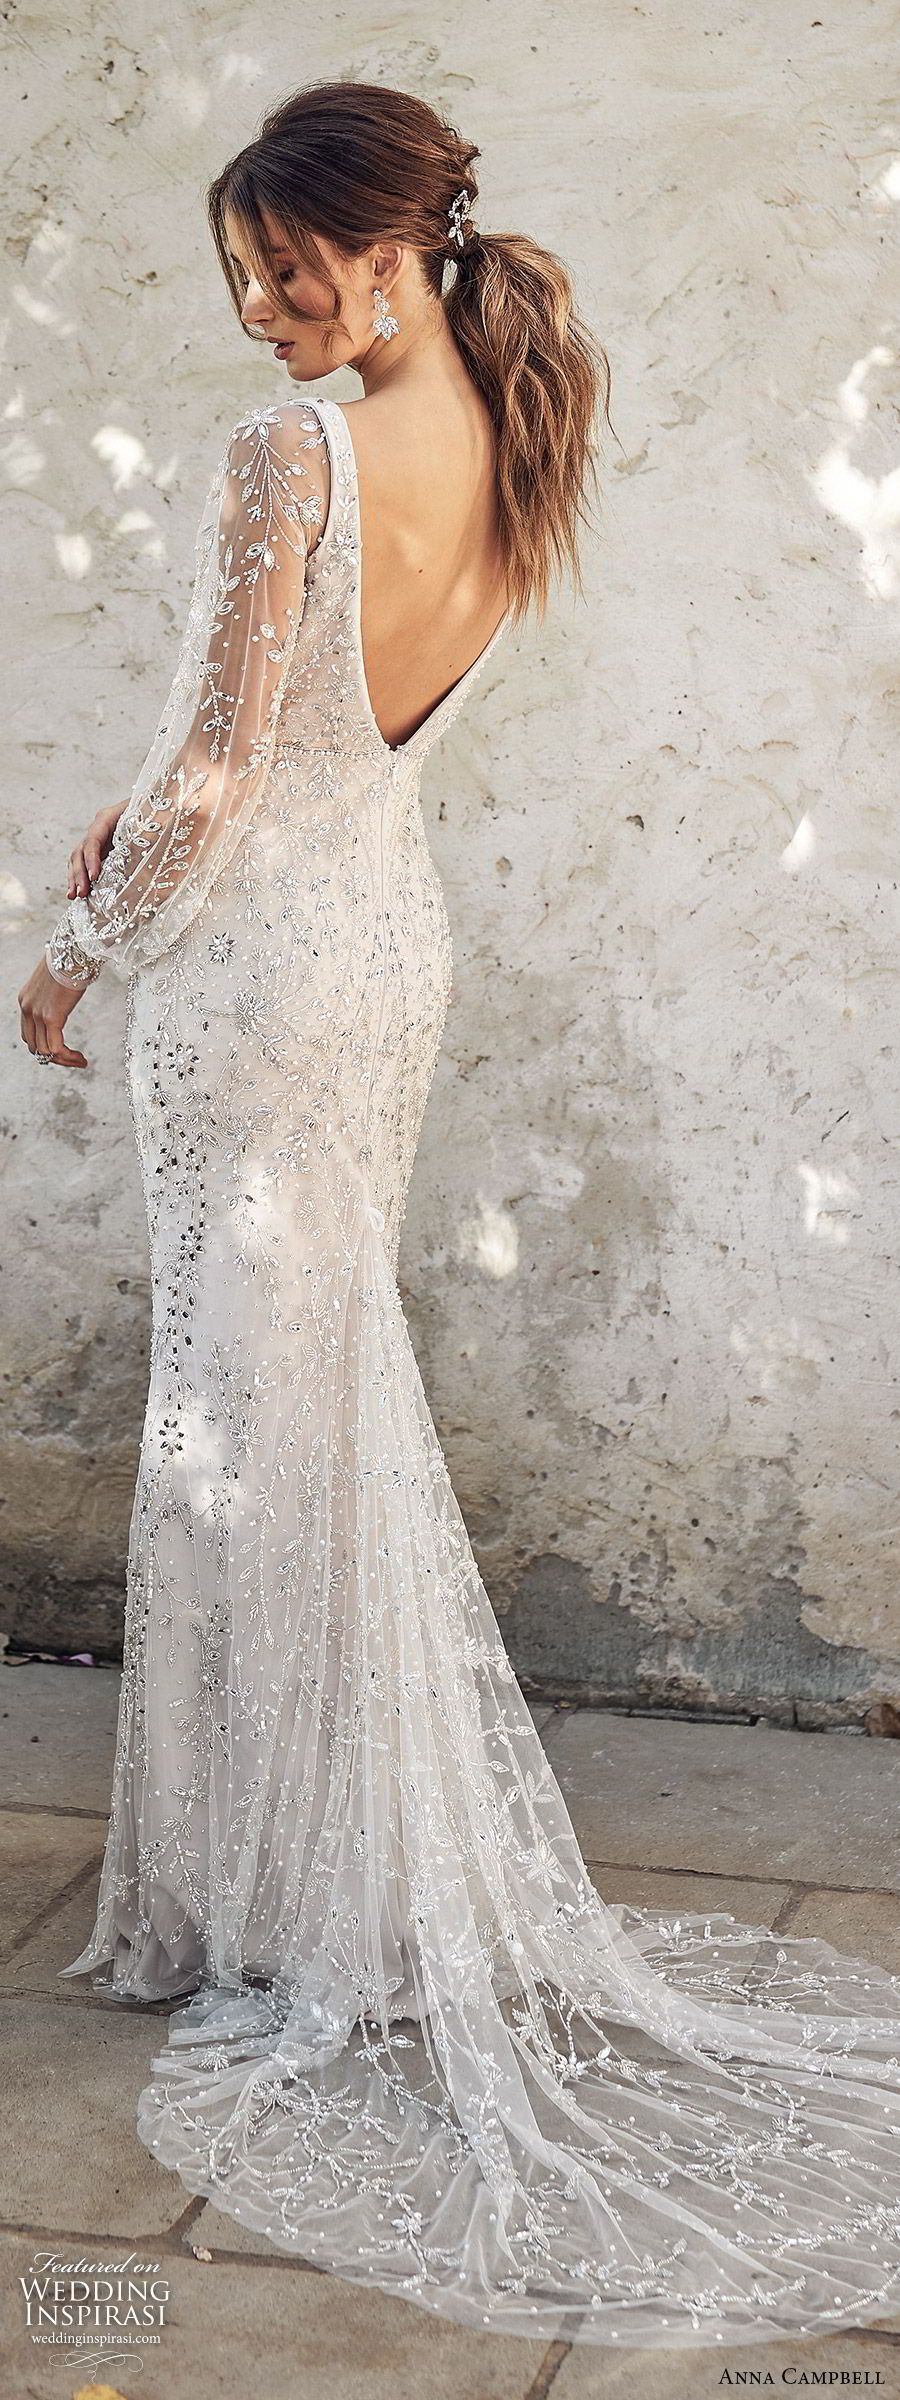 "Anna Campbell 2020 Wedding Dresses — ""Lumière"" Bridal Collection | Wedding Inspirasi"